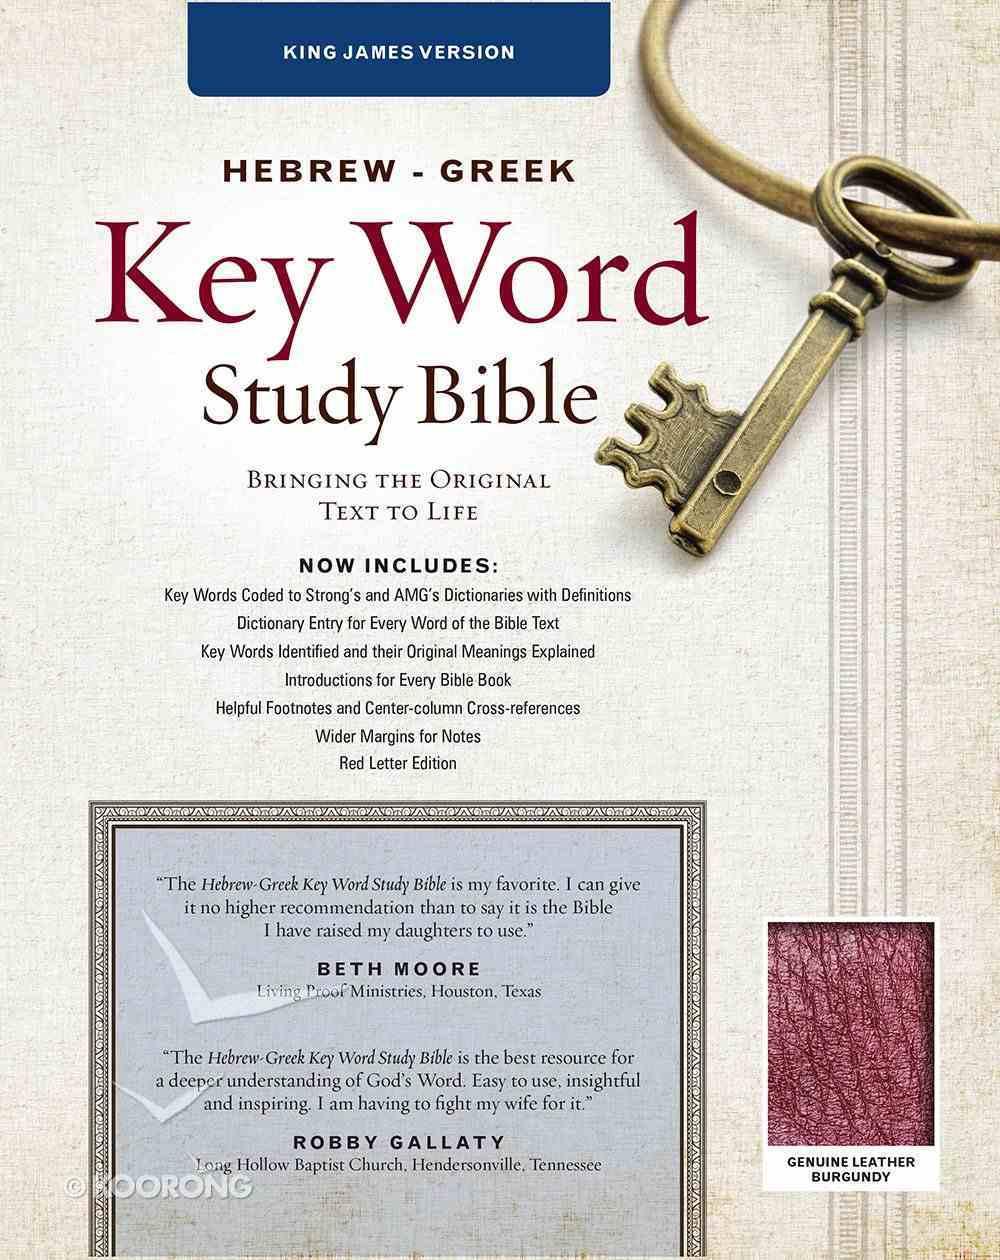 KJV Hebrew-Greek Key Word Study Bible Burgundy (New Edition) Genuine Leather